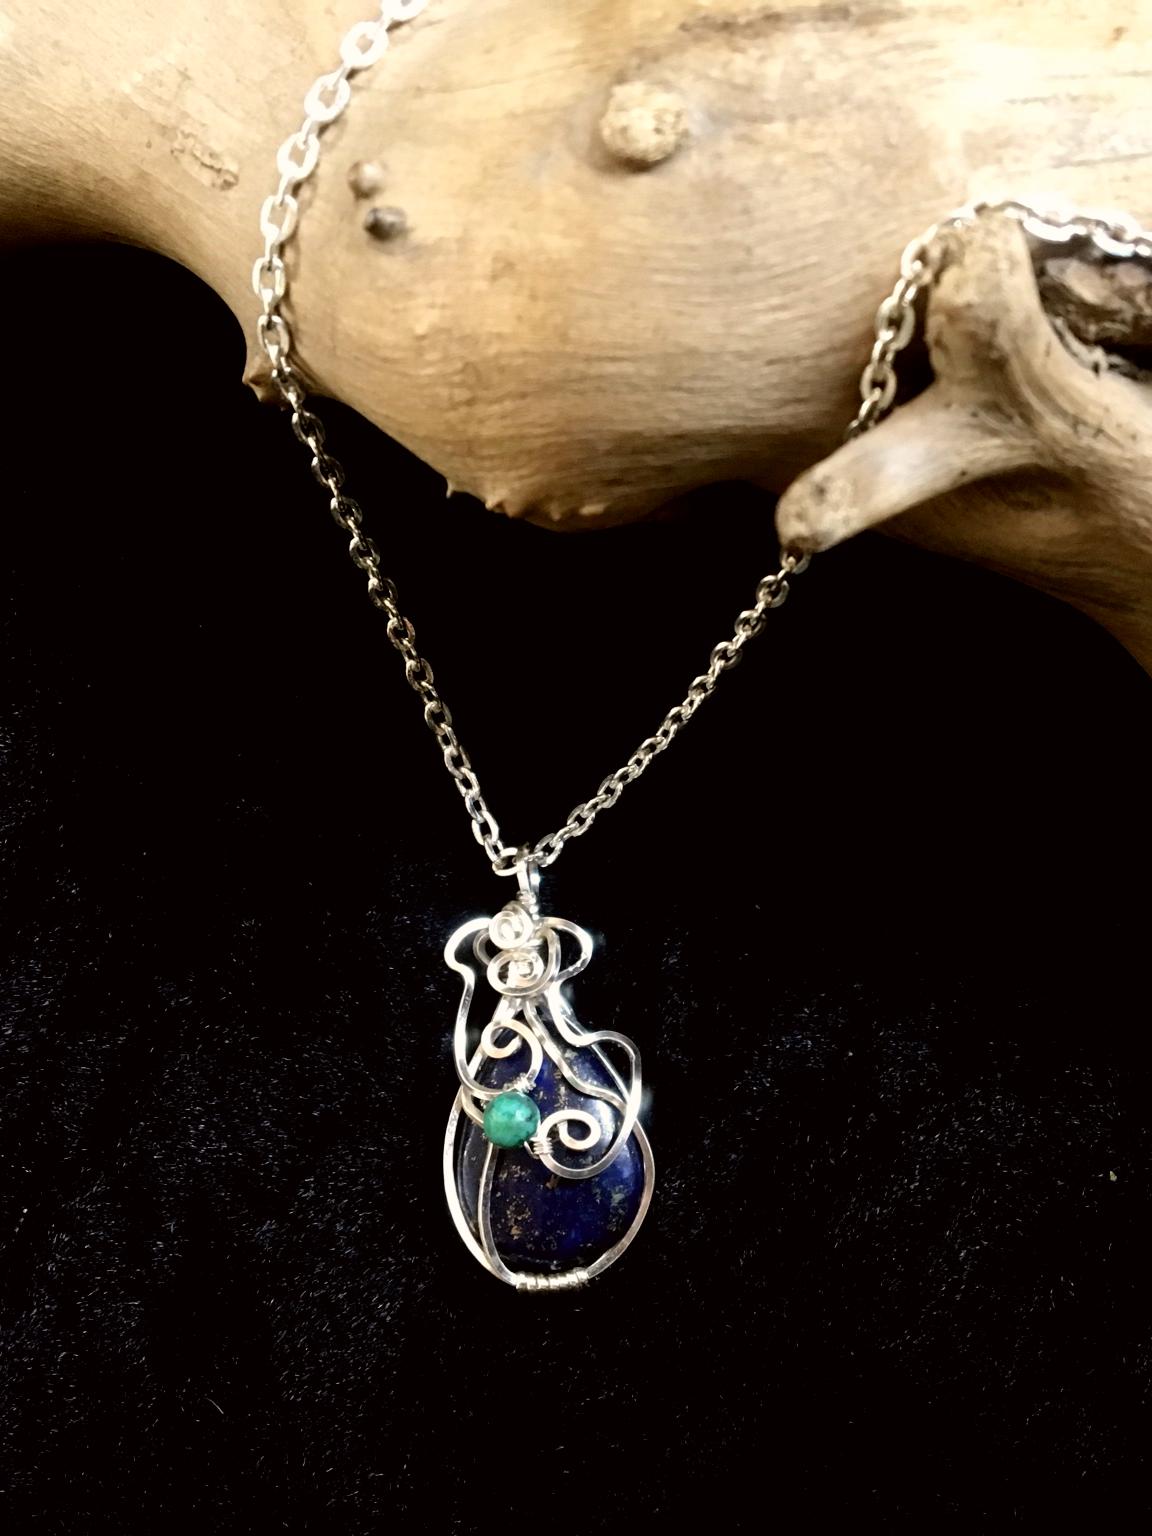 Qhresnna Quartz Necklace - Lapis Lazuli and Turquoise- Silver Plated